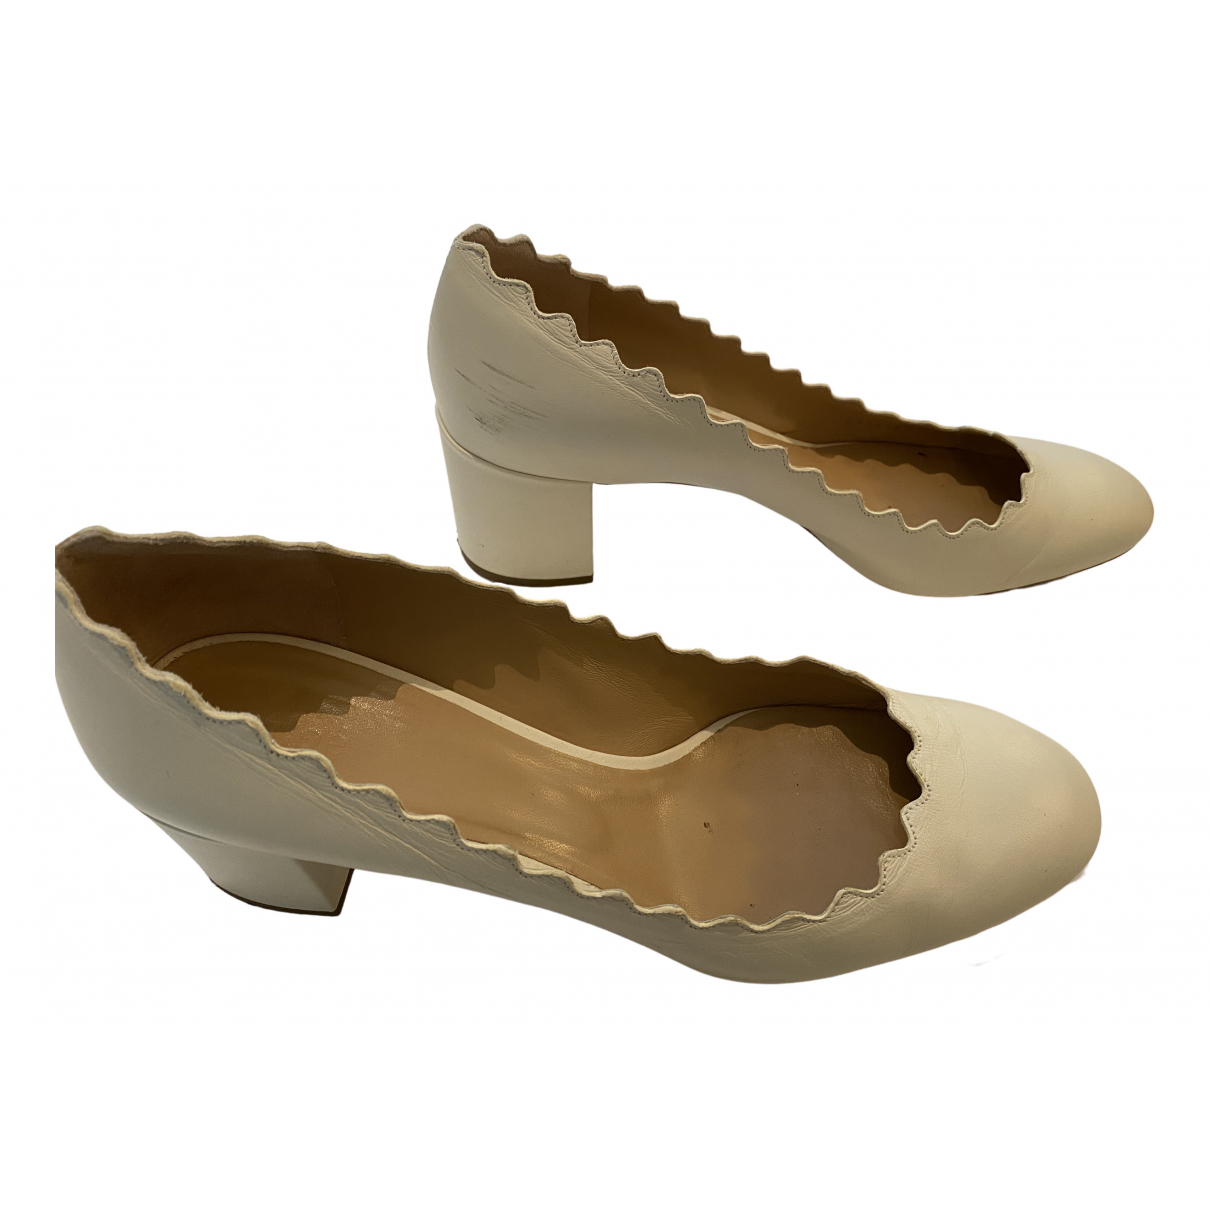 Chloé Lauren White Leather Heels for Women 40.5 EU